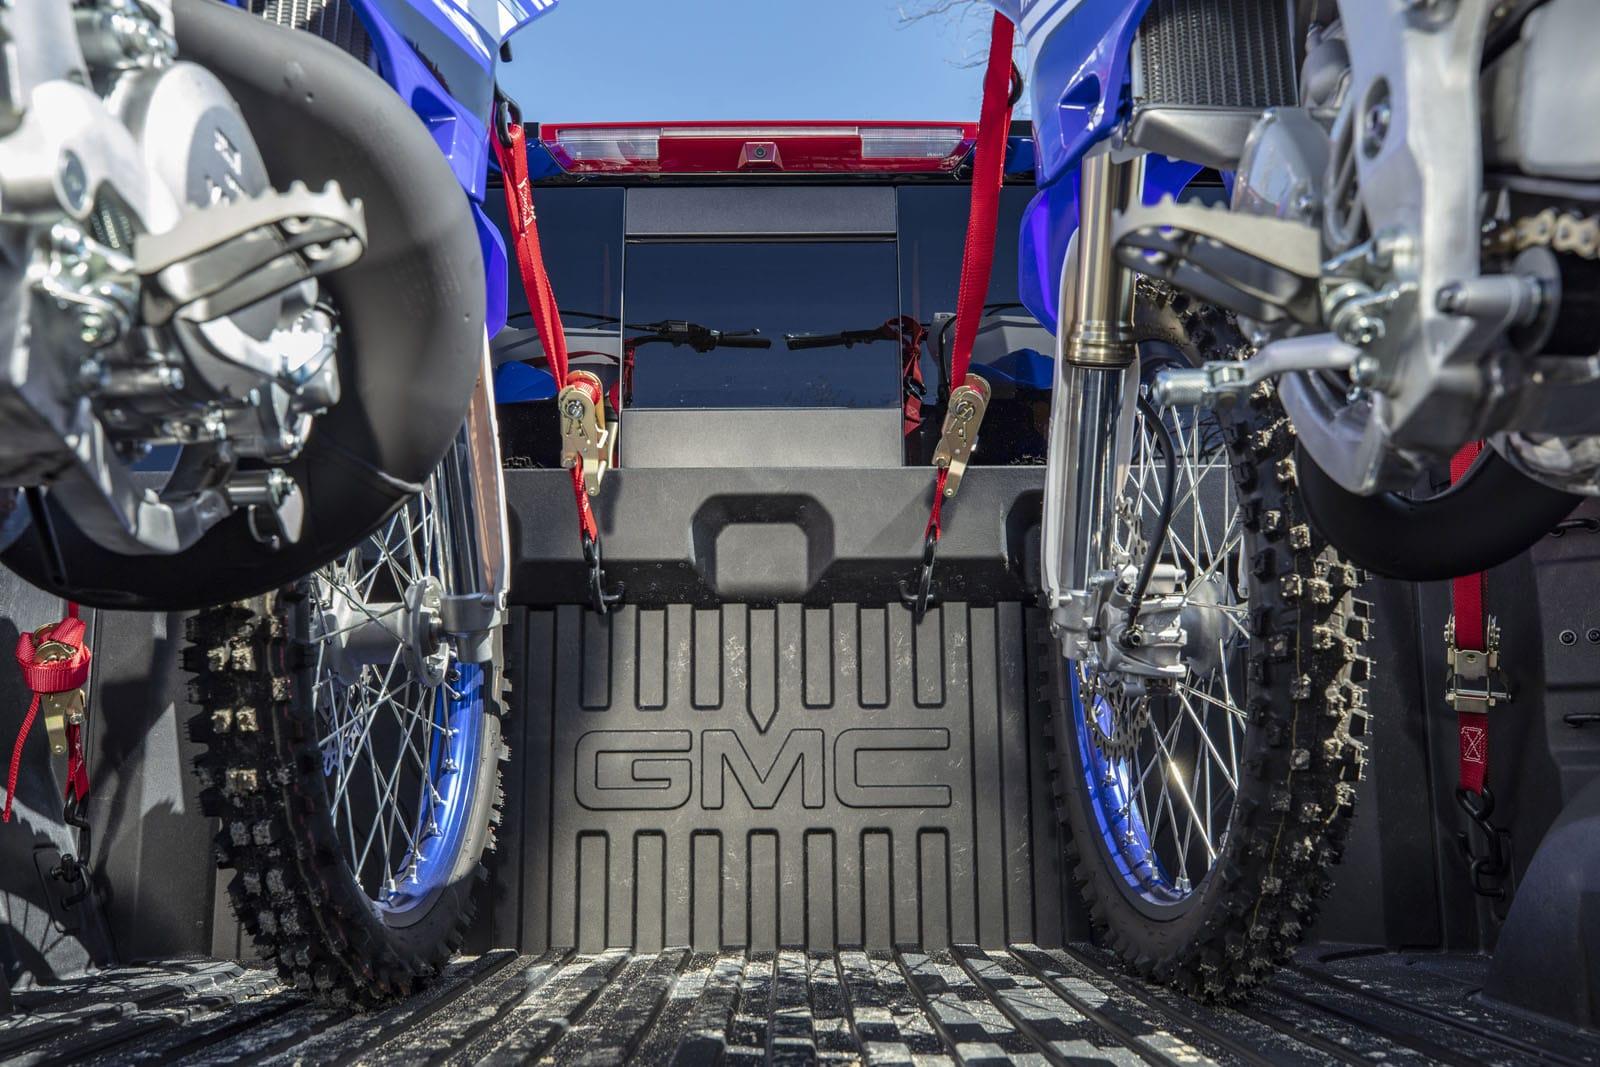 2019 GMC Sierra Denali CarbonPro Edition